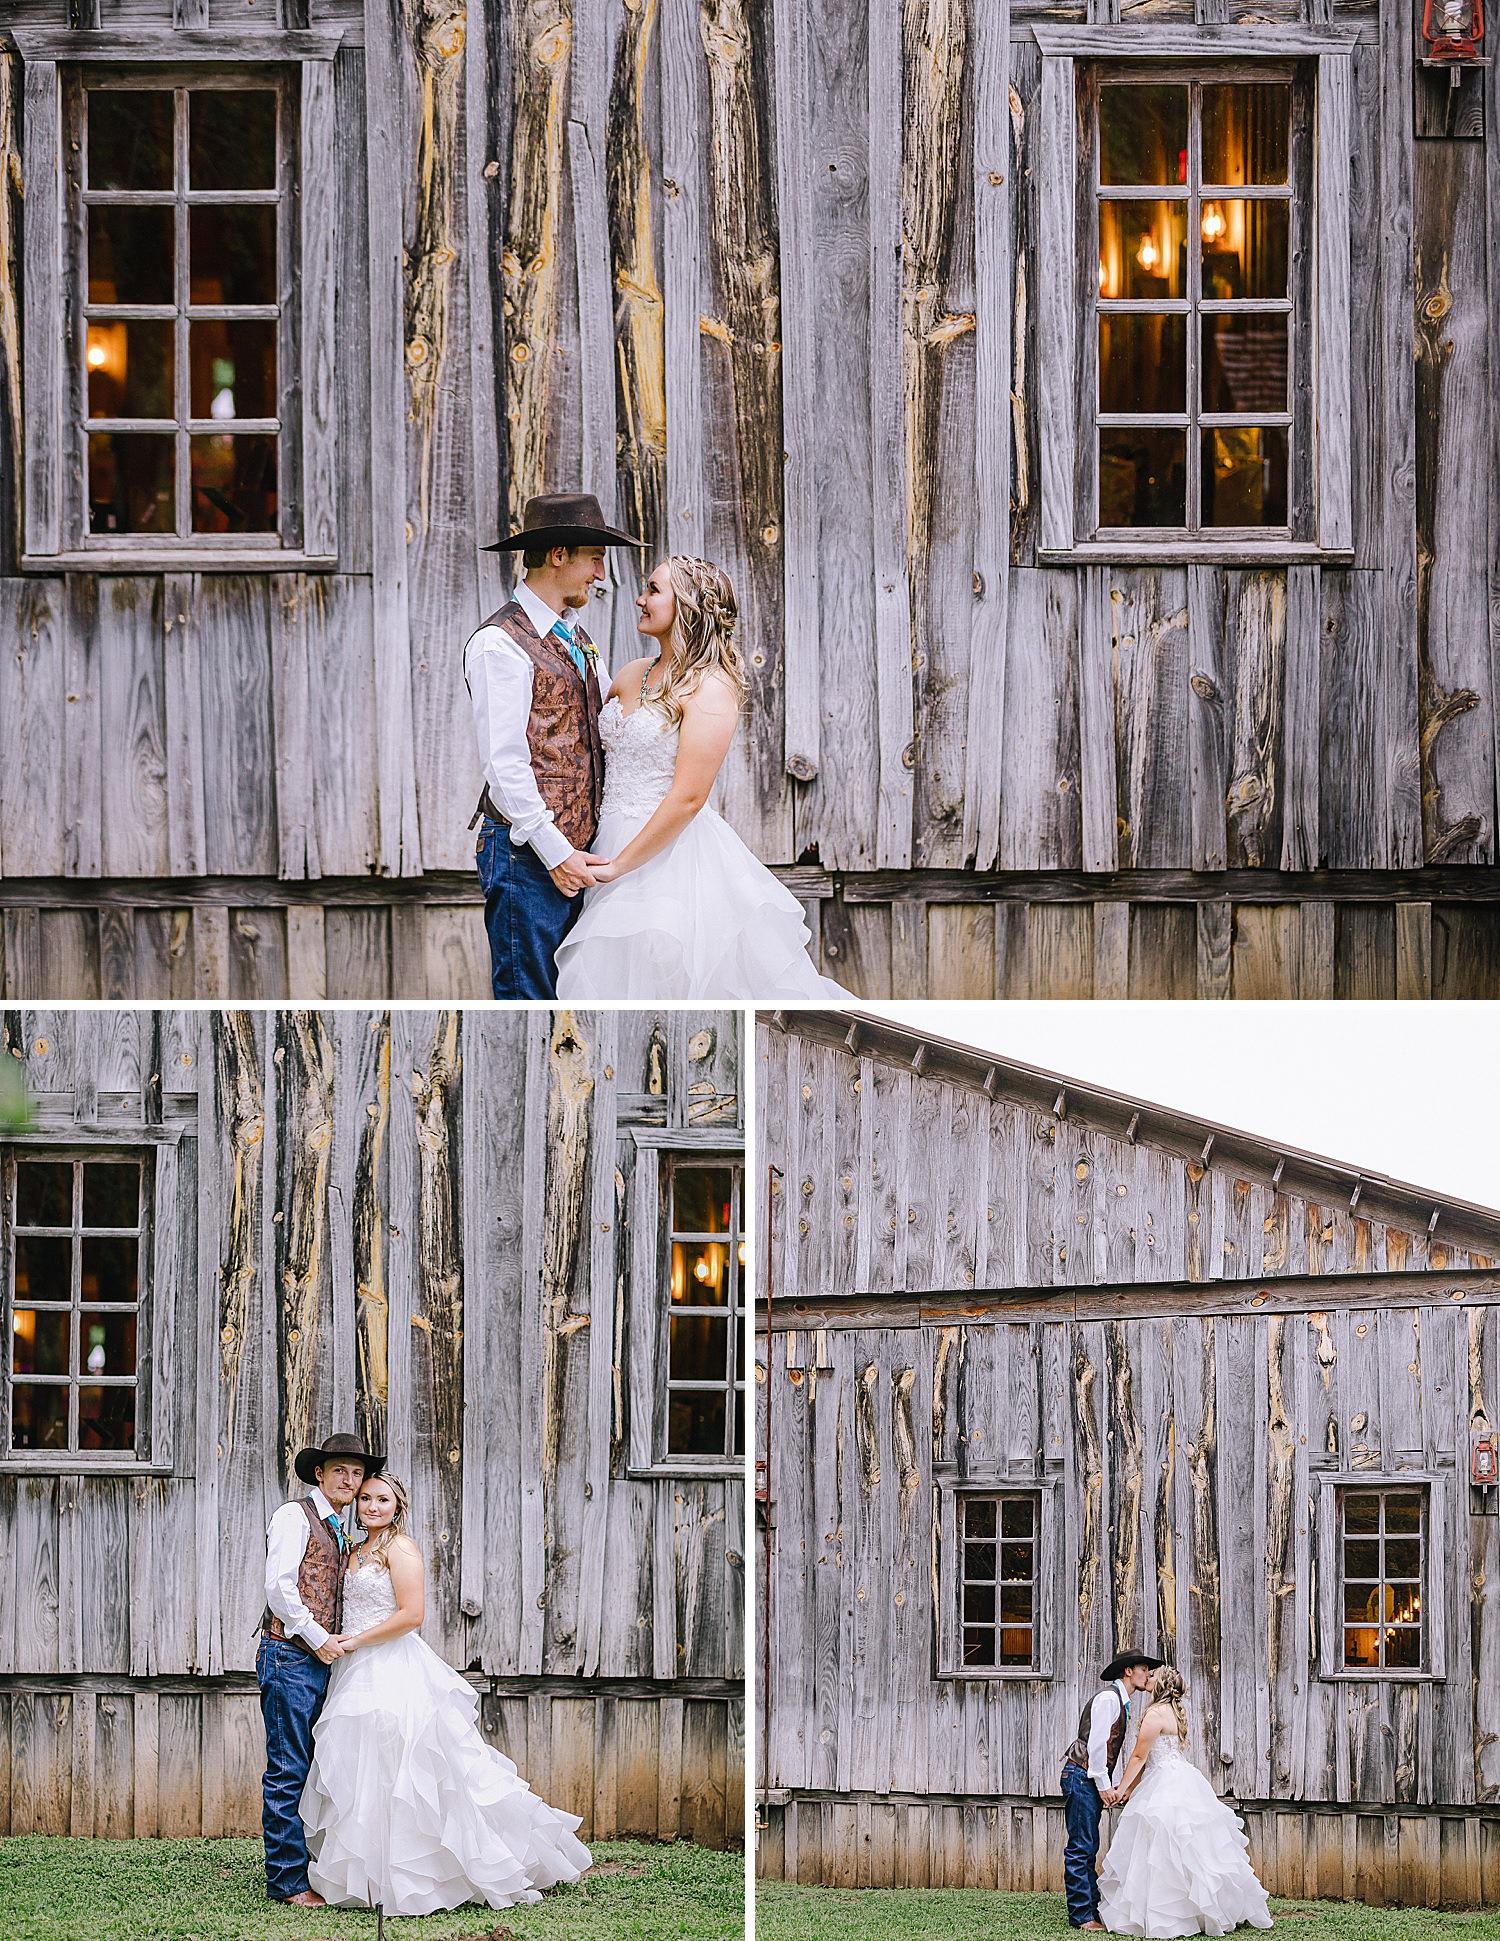 Carly-Barton-Photography-Old-Town-Texas-Rustic-Wedding-Photos-Sunflowers-Boots-Kyle-Texas_0064.jpg